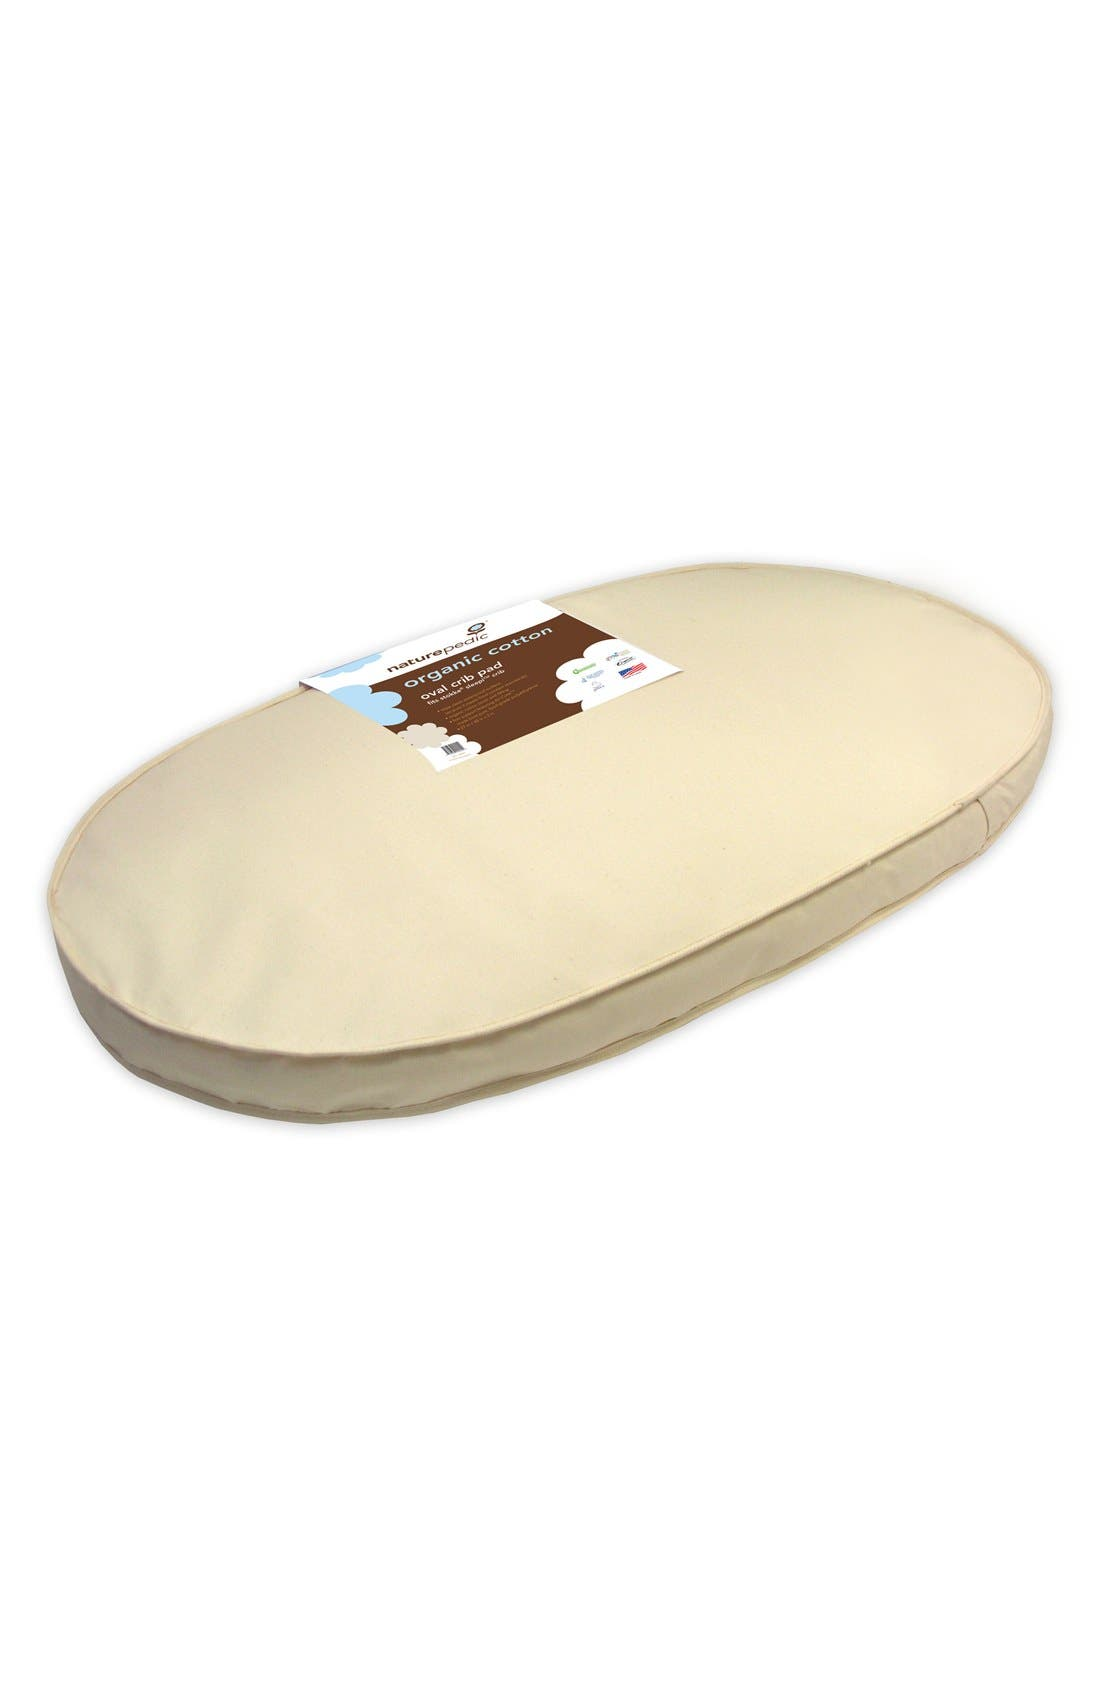 main image naturepedic organic cotton oval crib mattress for stokke sleepi crib - Crib Mattresses